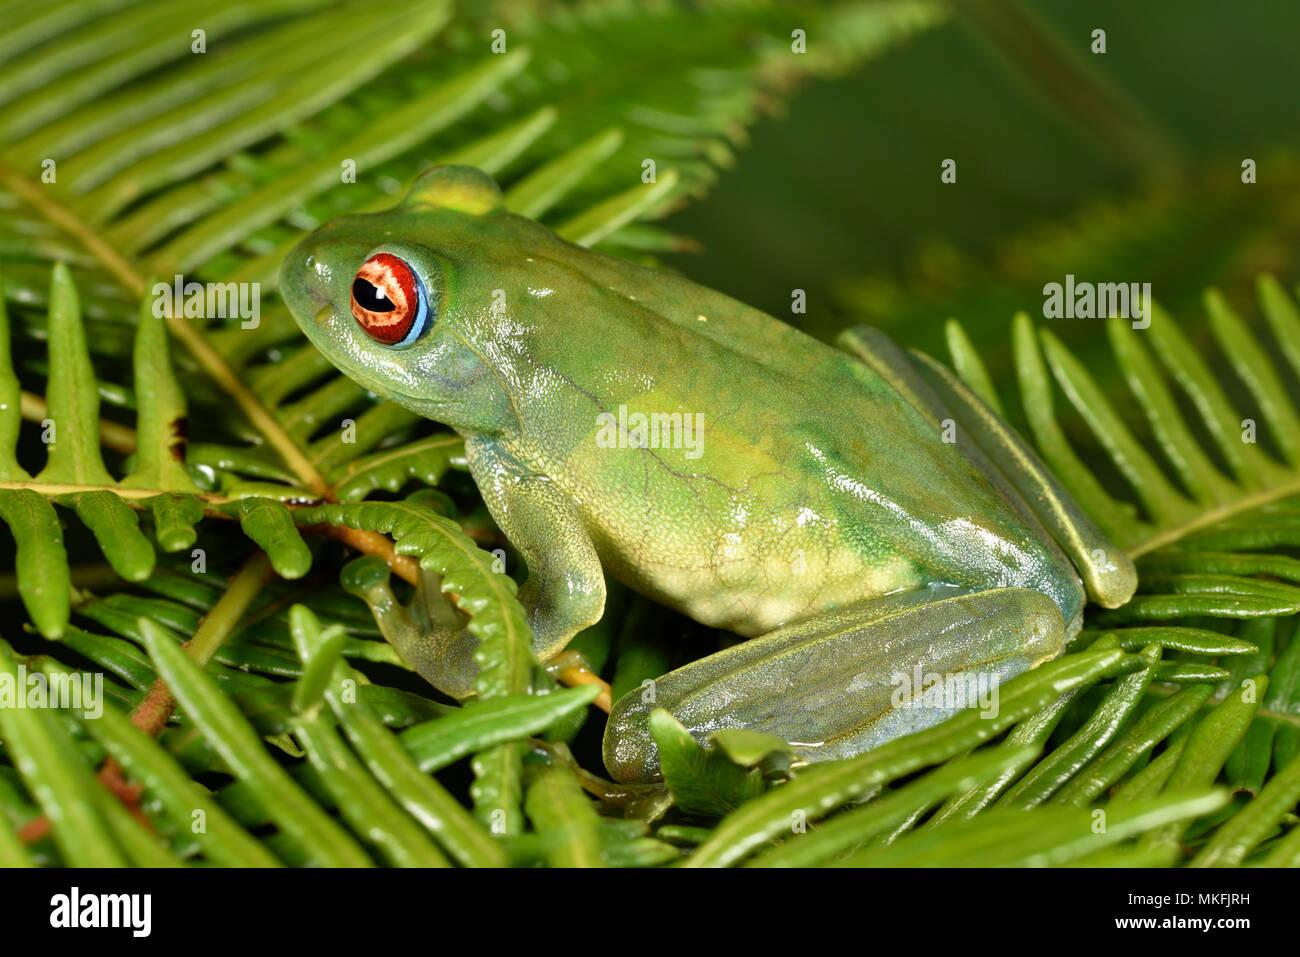 Ankafana Bright-eyed Frog (Boophis luteus) pregnant female, vision of eggs on the side, Andasibe, Perinet, Alaotra-Mangoro Region, Madagascar - Stock Image